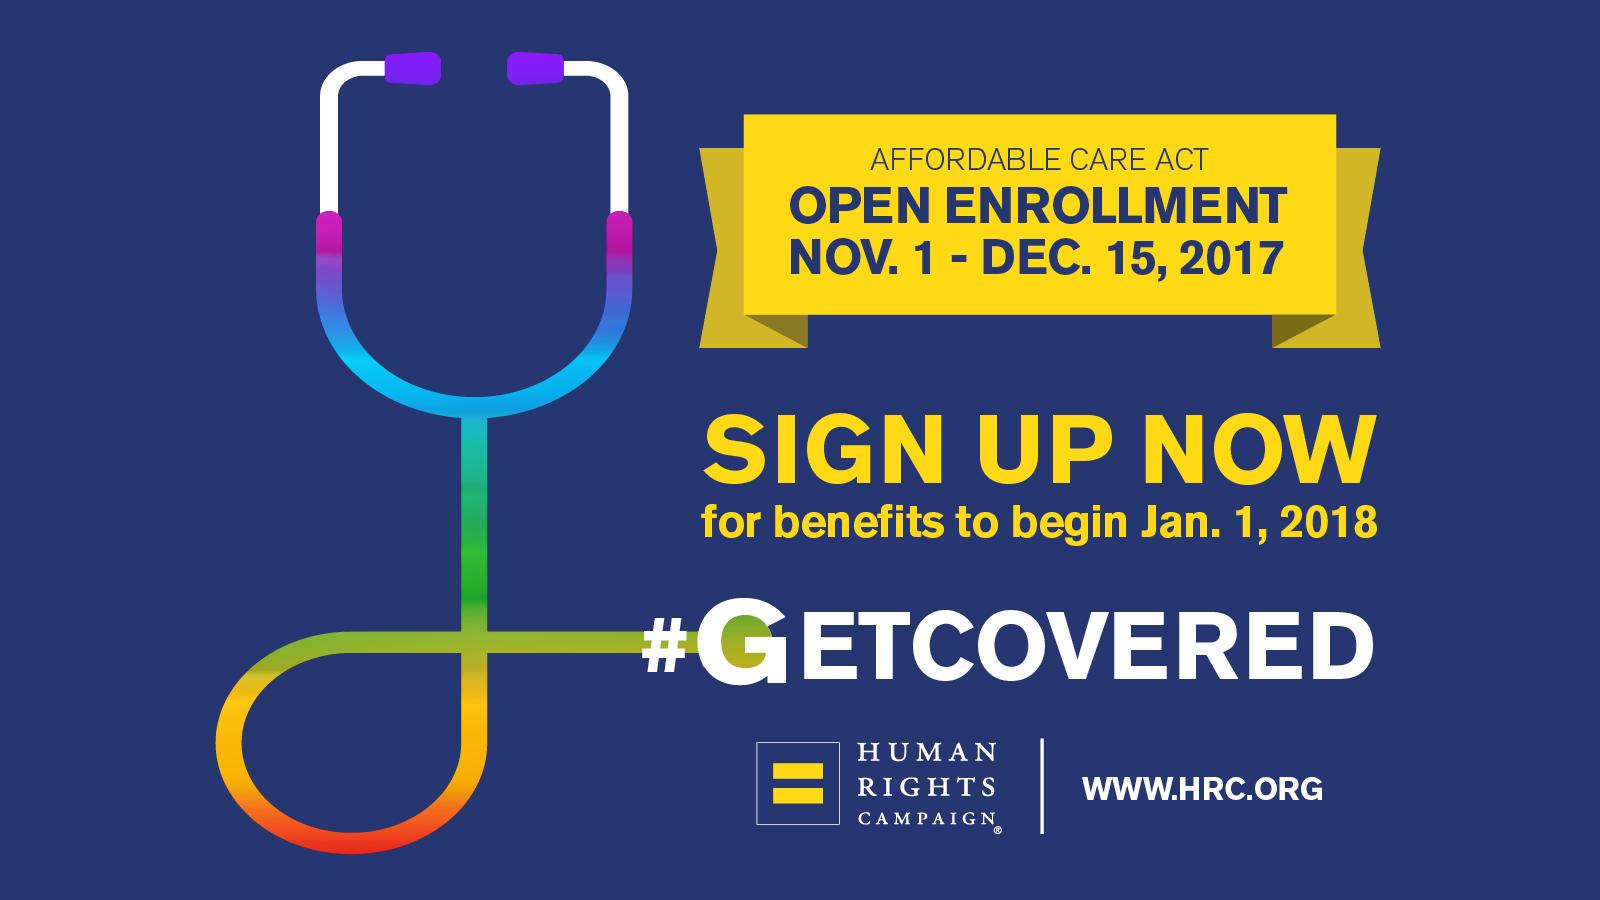 Affordable Care Act Open Enrollment: FAQ